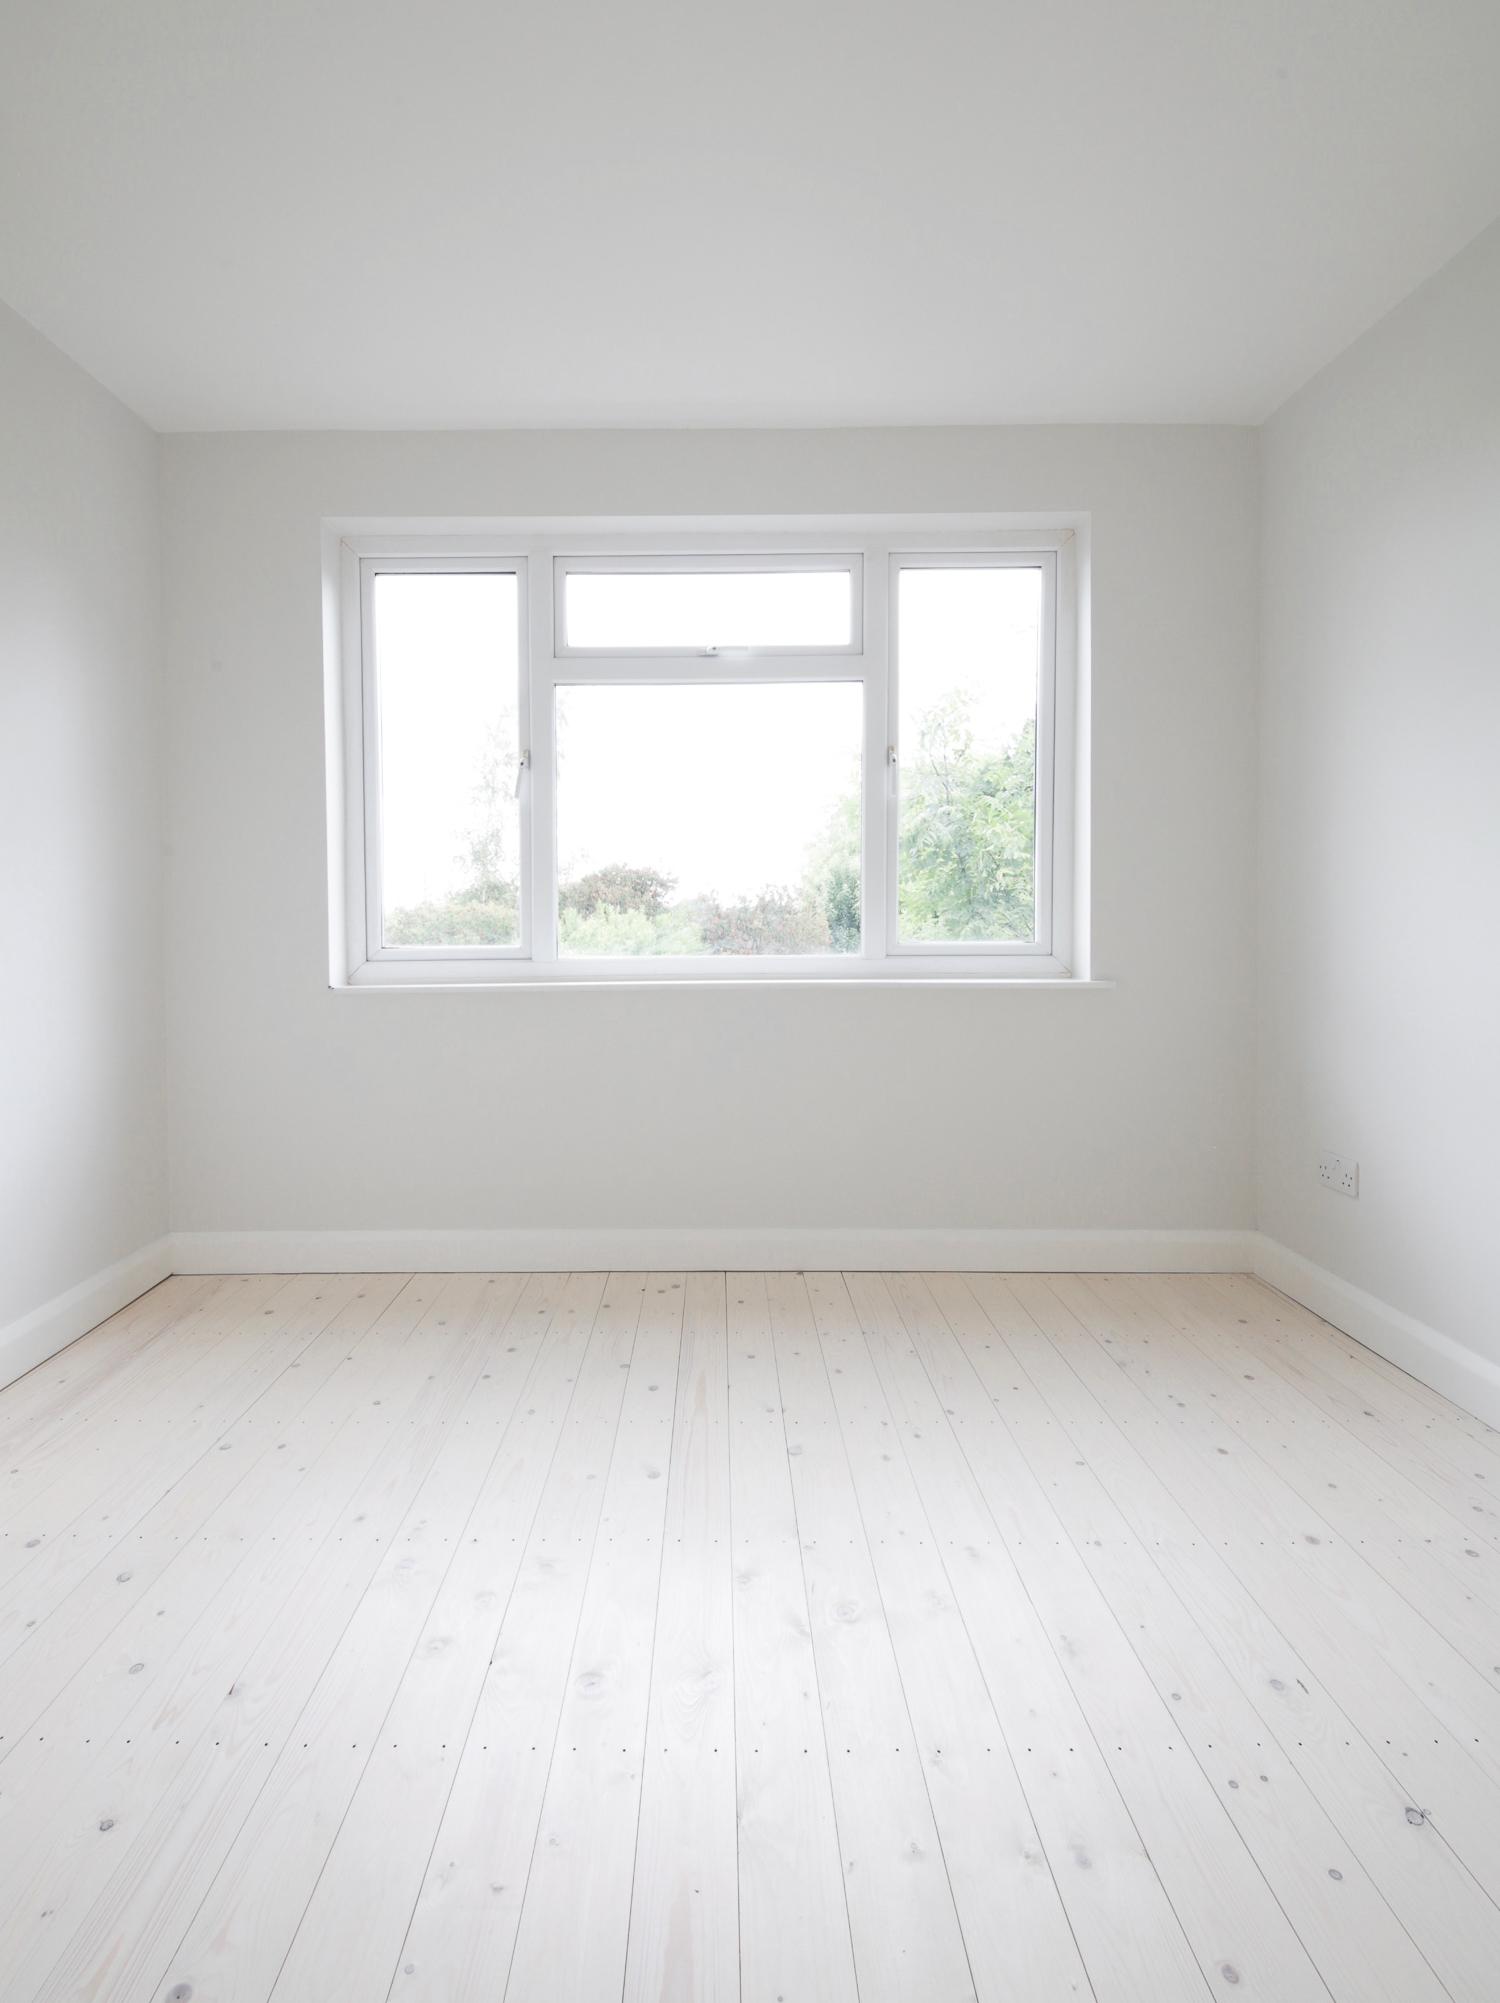 Freshly plastered room with pale wood flooring | Design Hunter